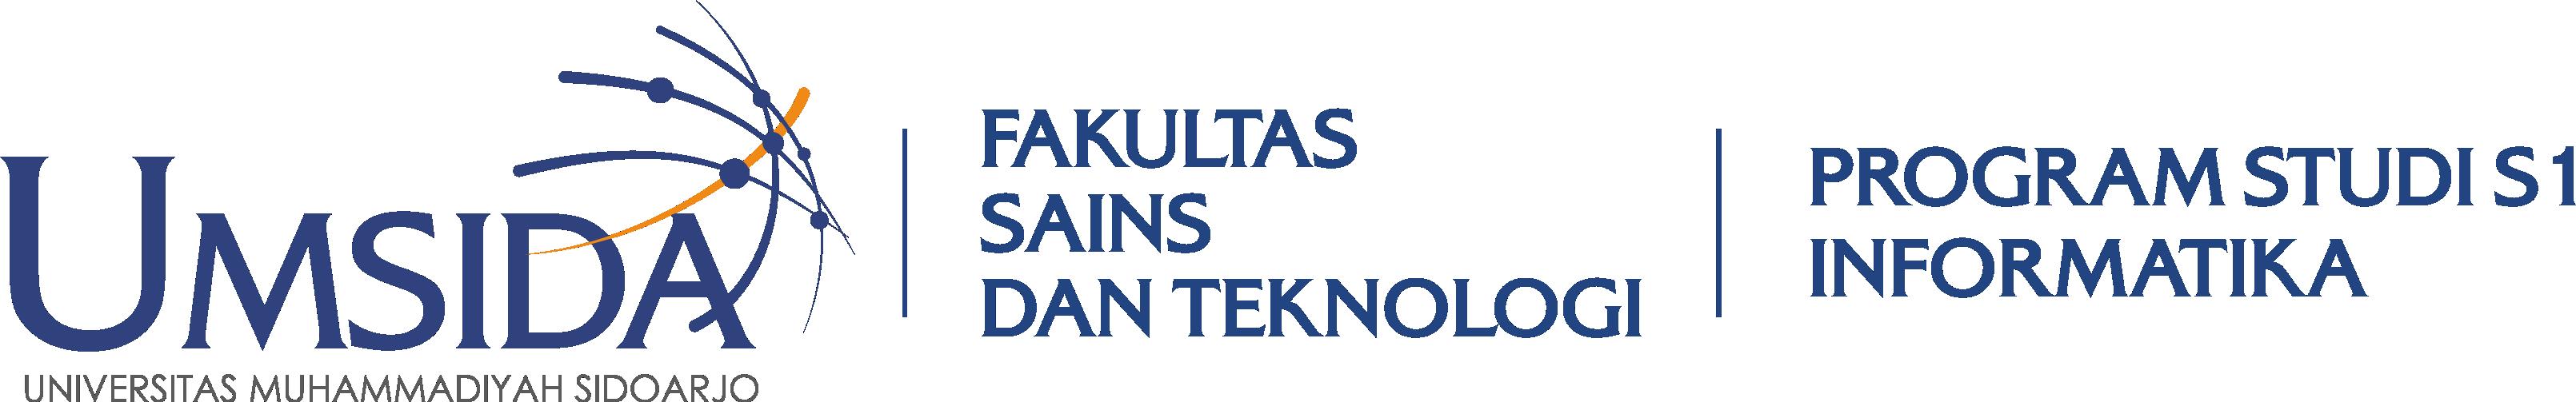 Pendaftaran Skripsi Gelombang 7 Tanggal 16 Agustus 26 Agustus 2018 Bagi Informatika Informatika